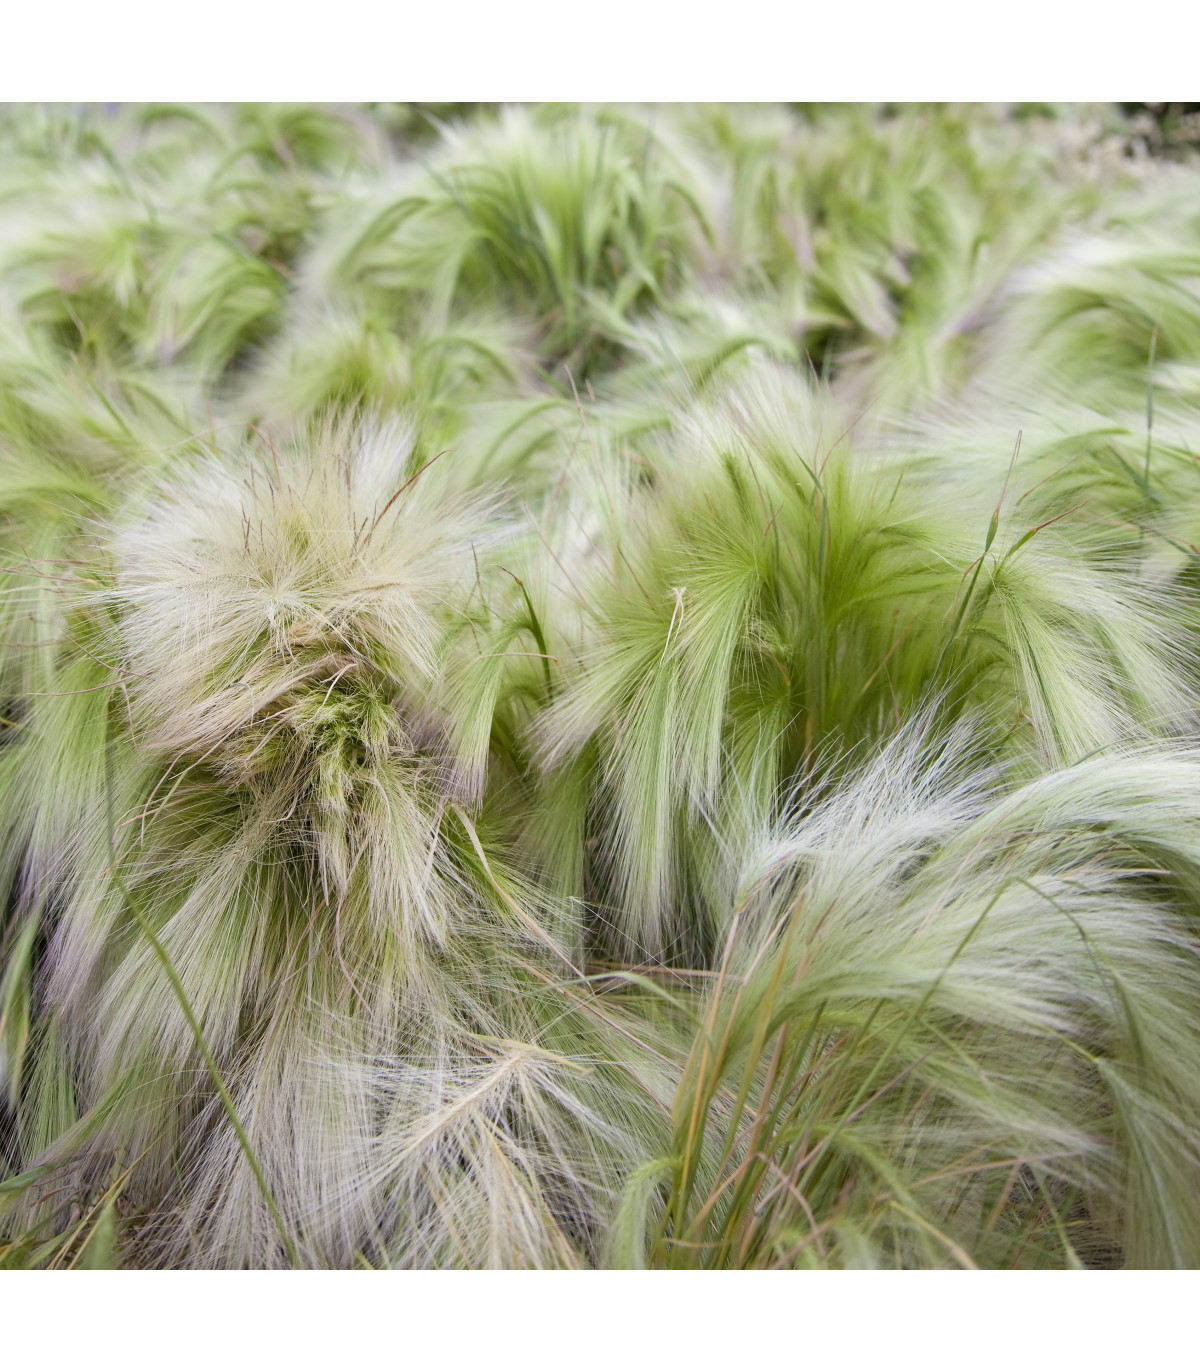 Jačmeň hrivnatý - semená jačmeňa - Hordeum jubatum - 10 ks